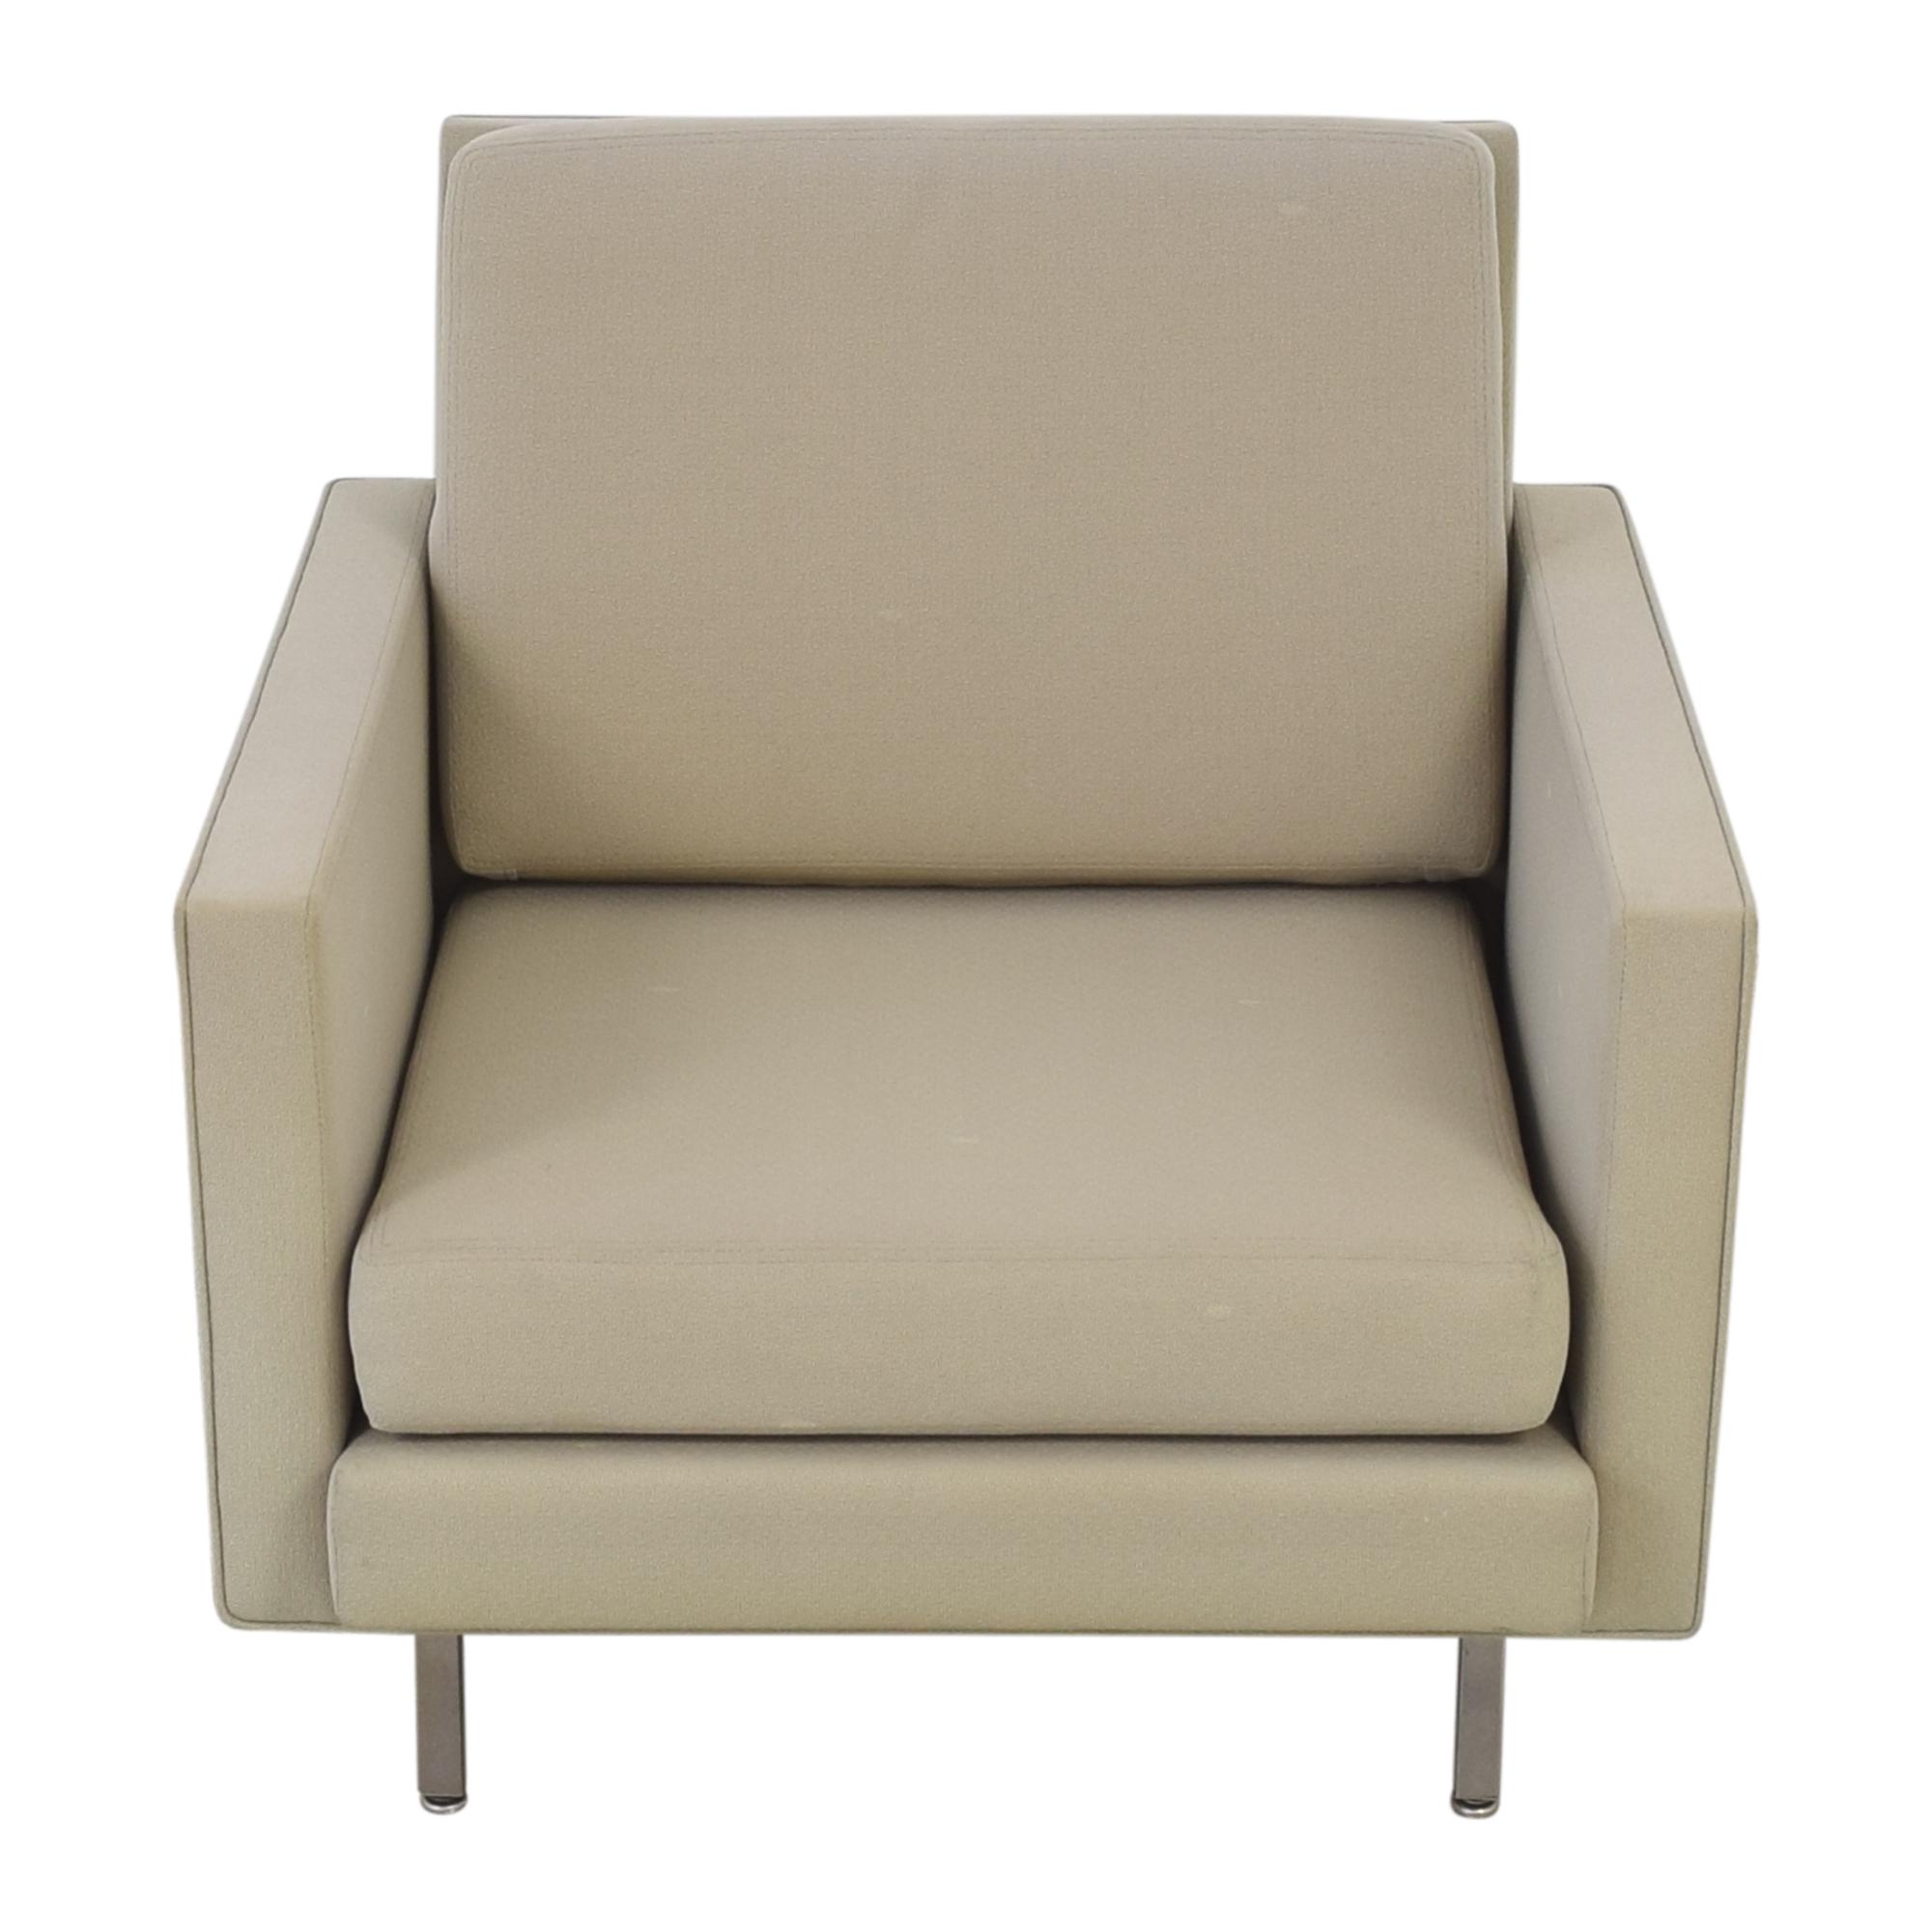 buy Modernica Modernica Case Study Furniture Chair online